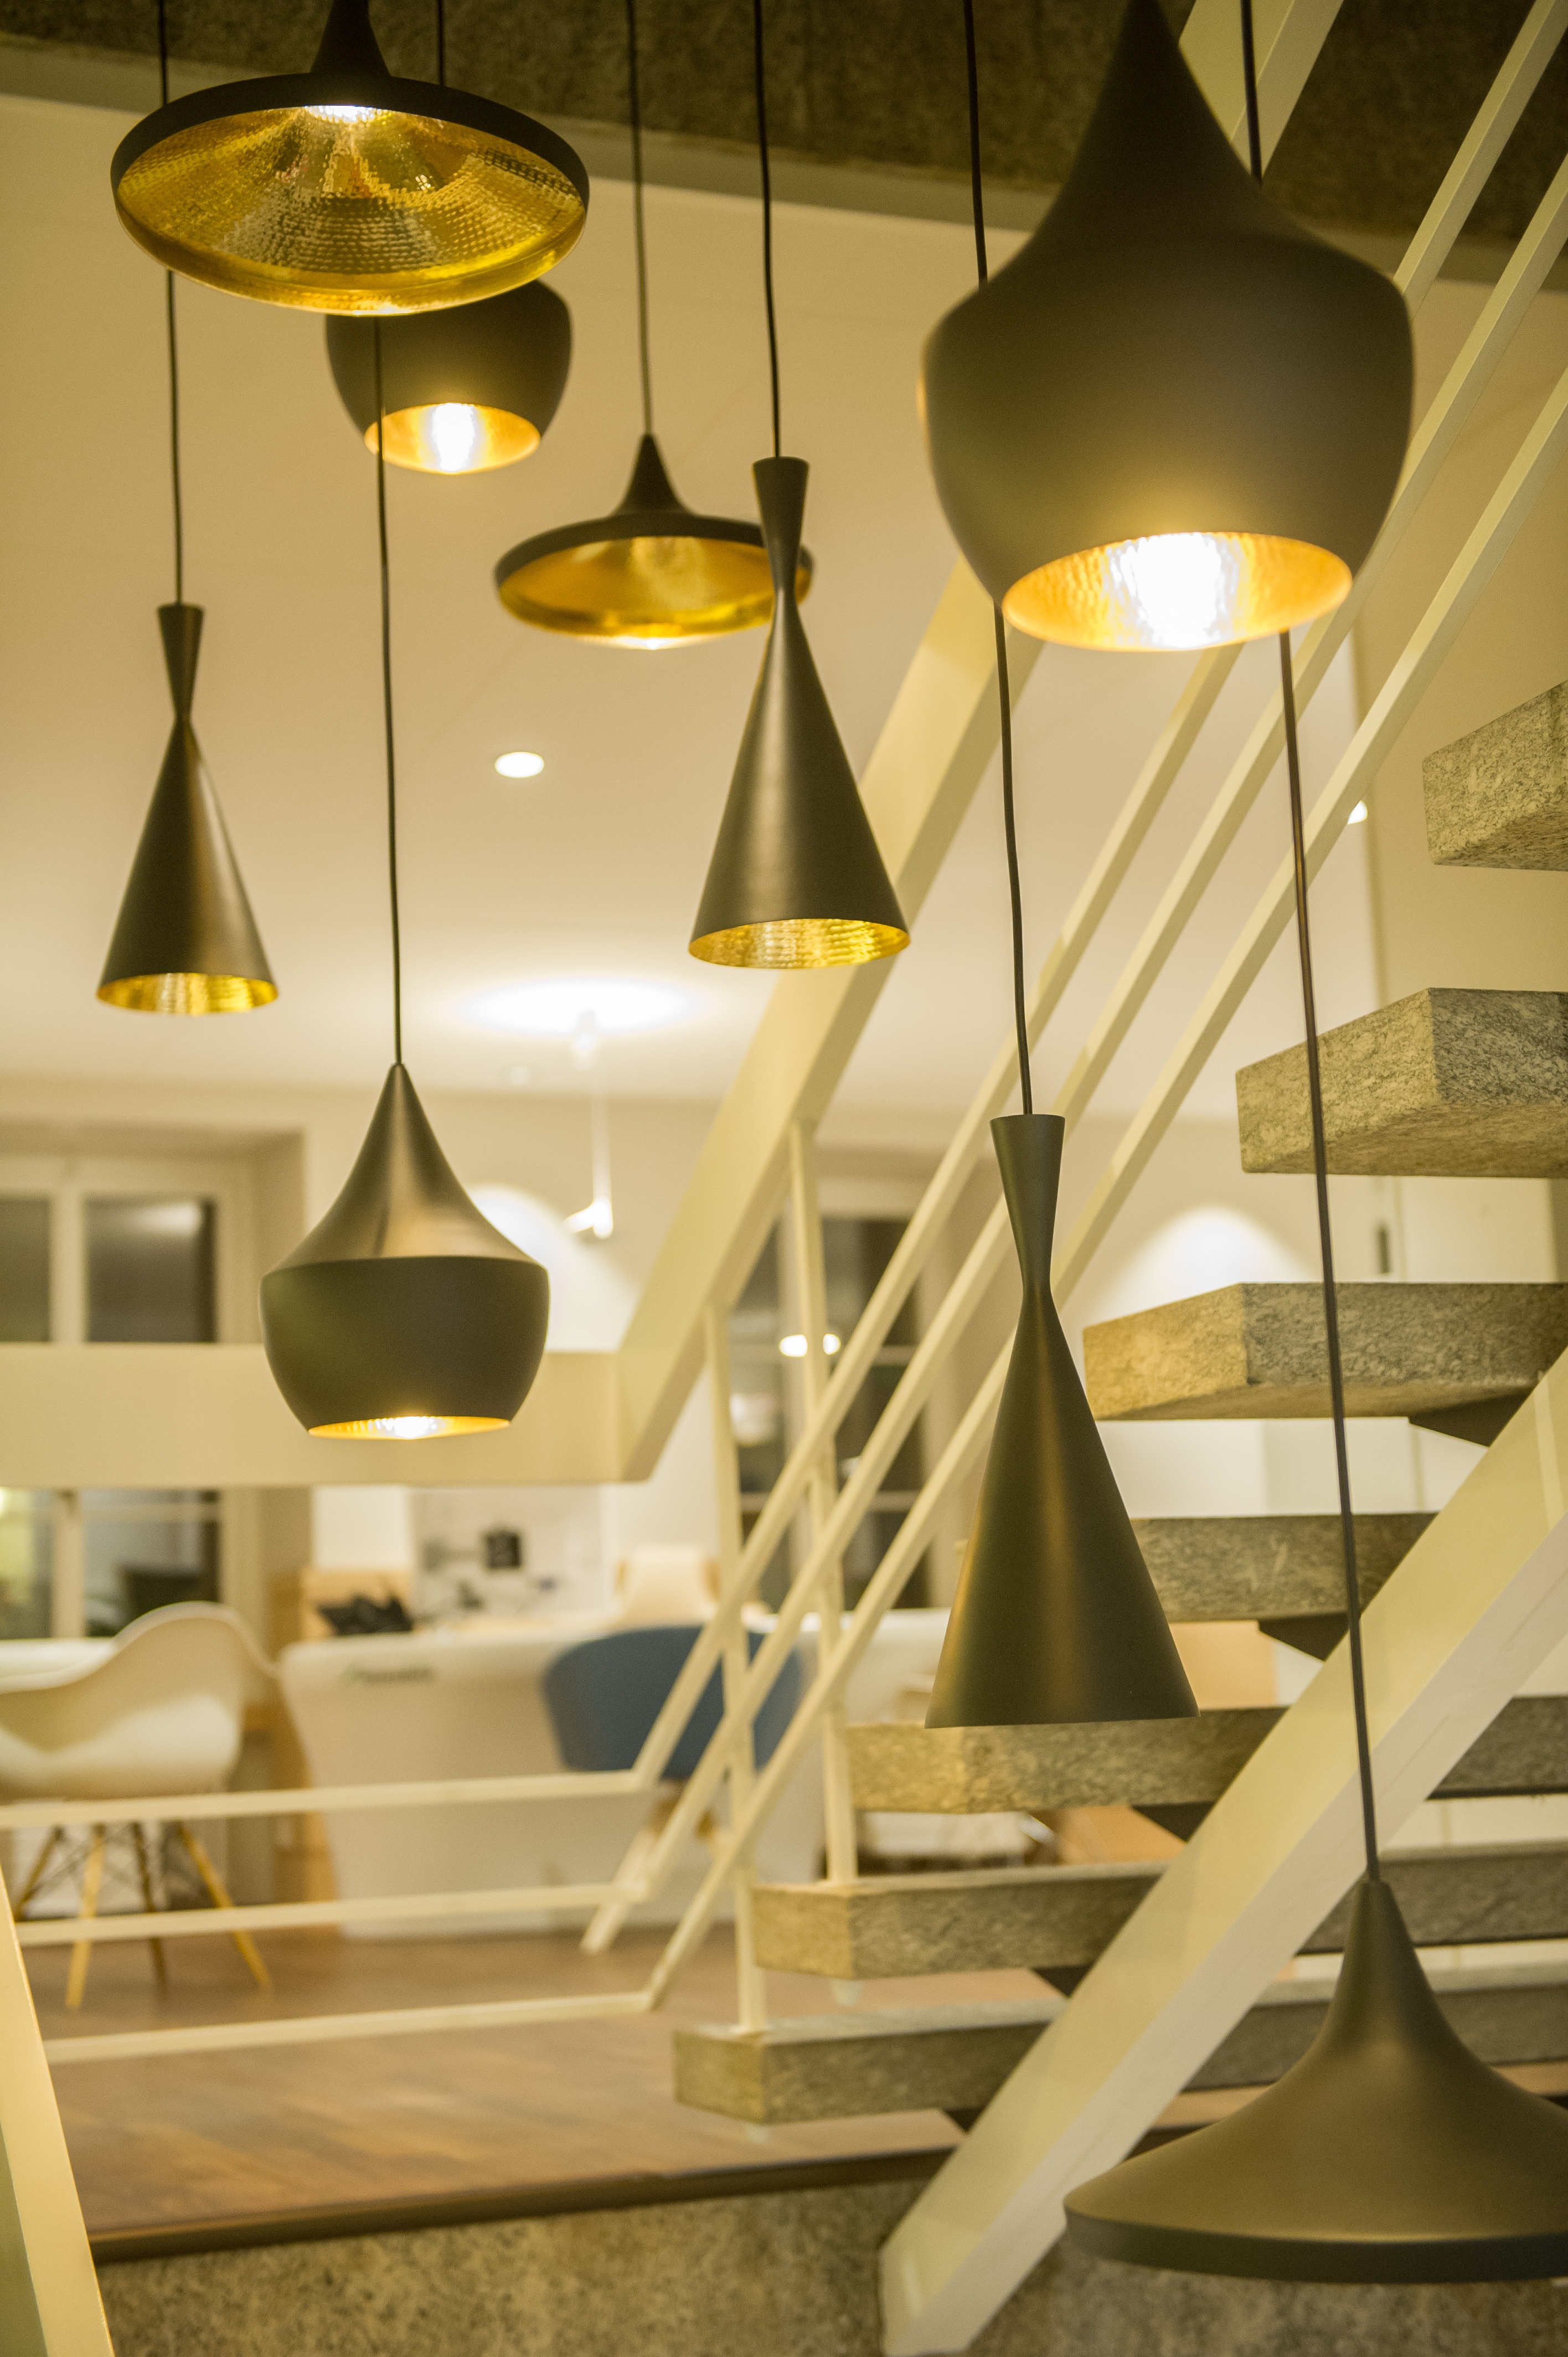 Twerenbold reisen baden innenarchitektur leitgedanke for Design innenarchitektur